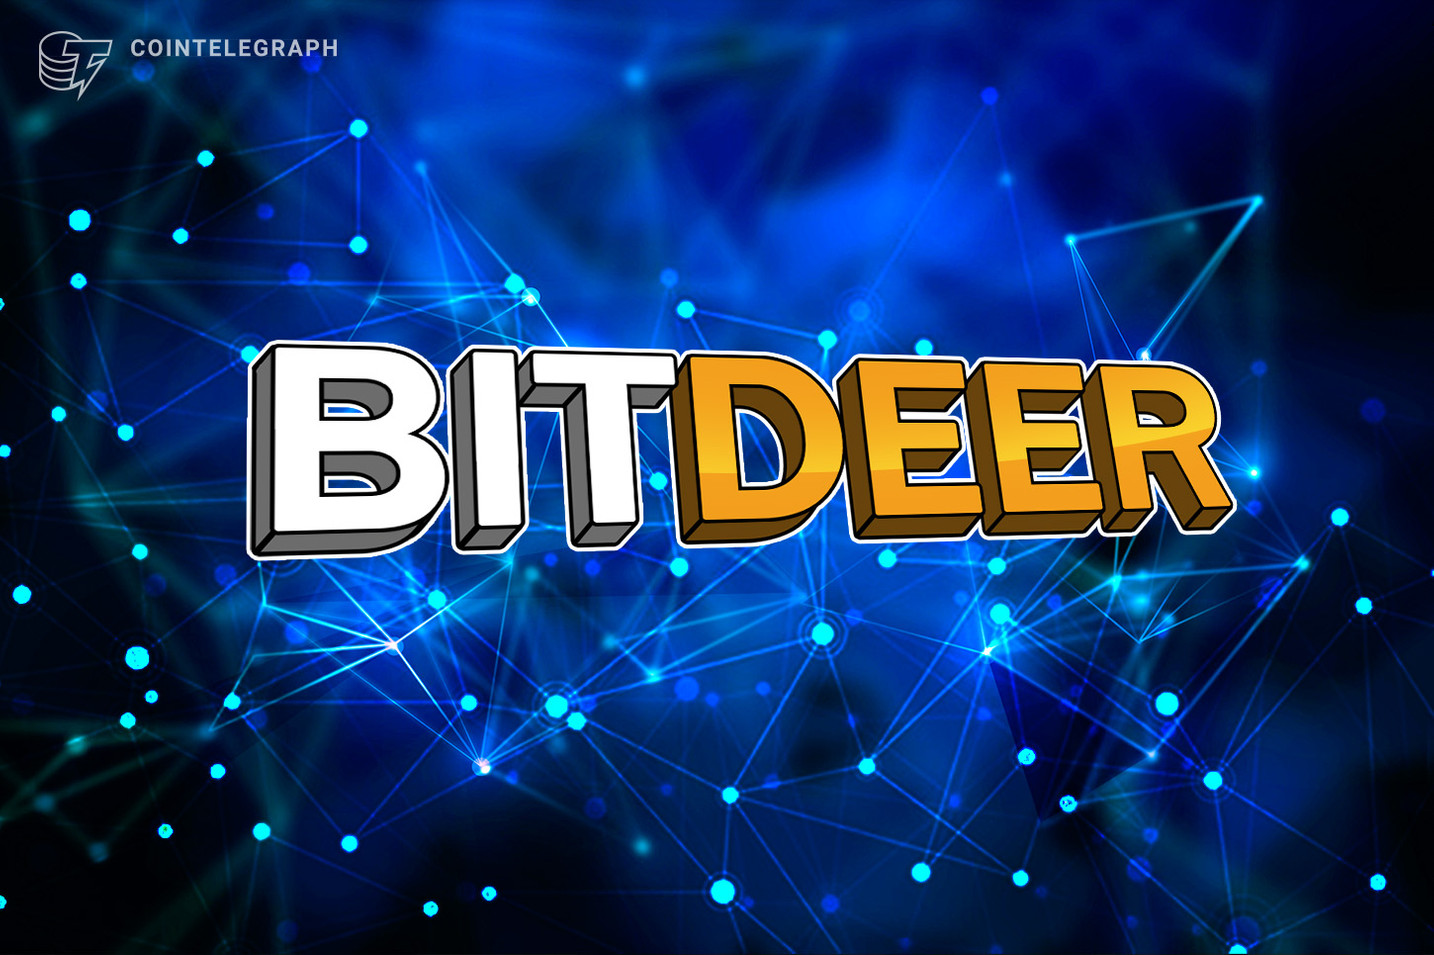 BitBeer استخراج رمزنگاری رمزارزها